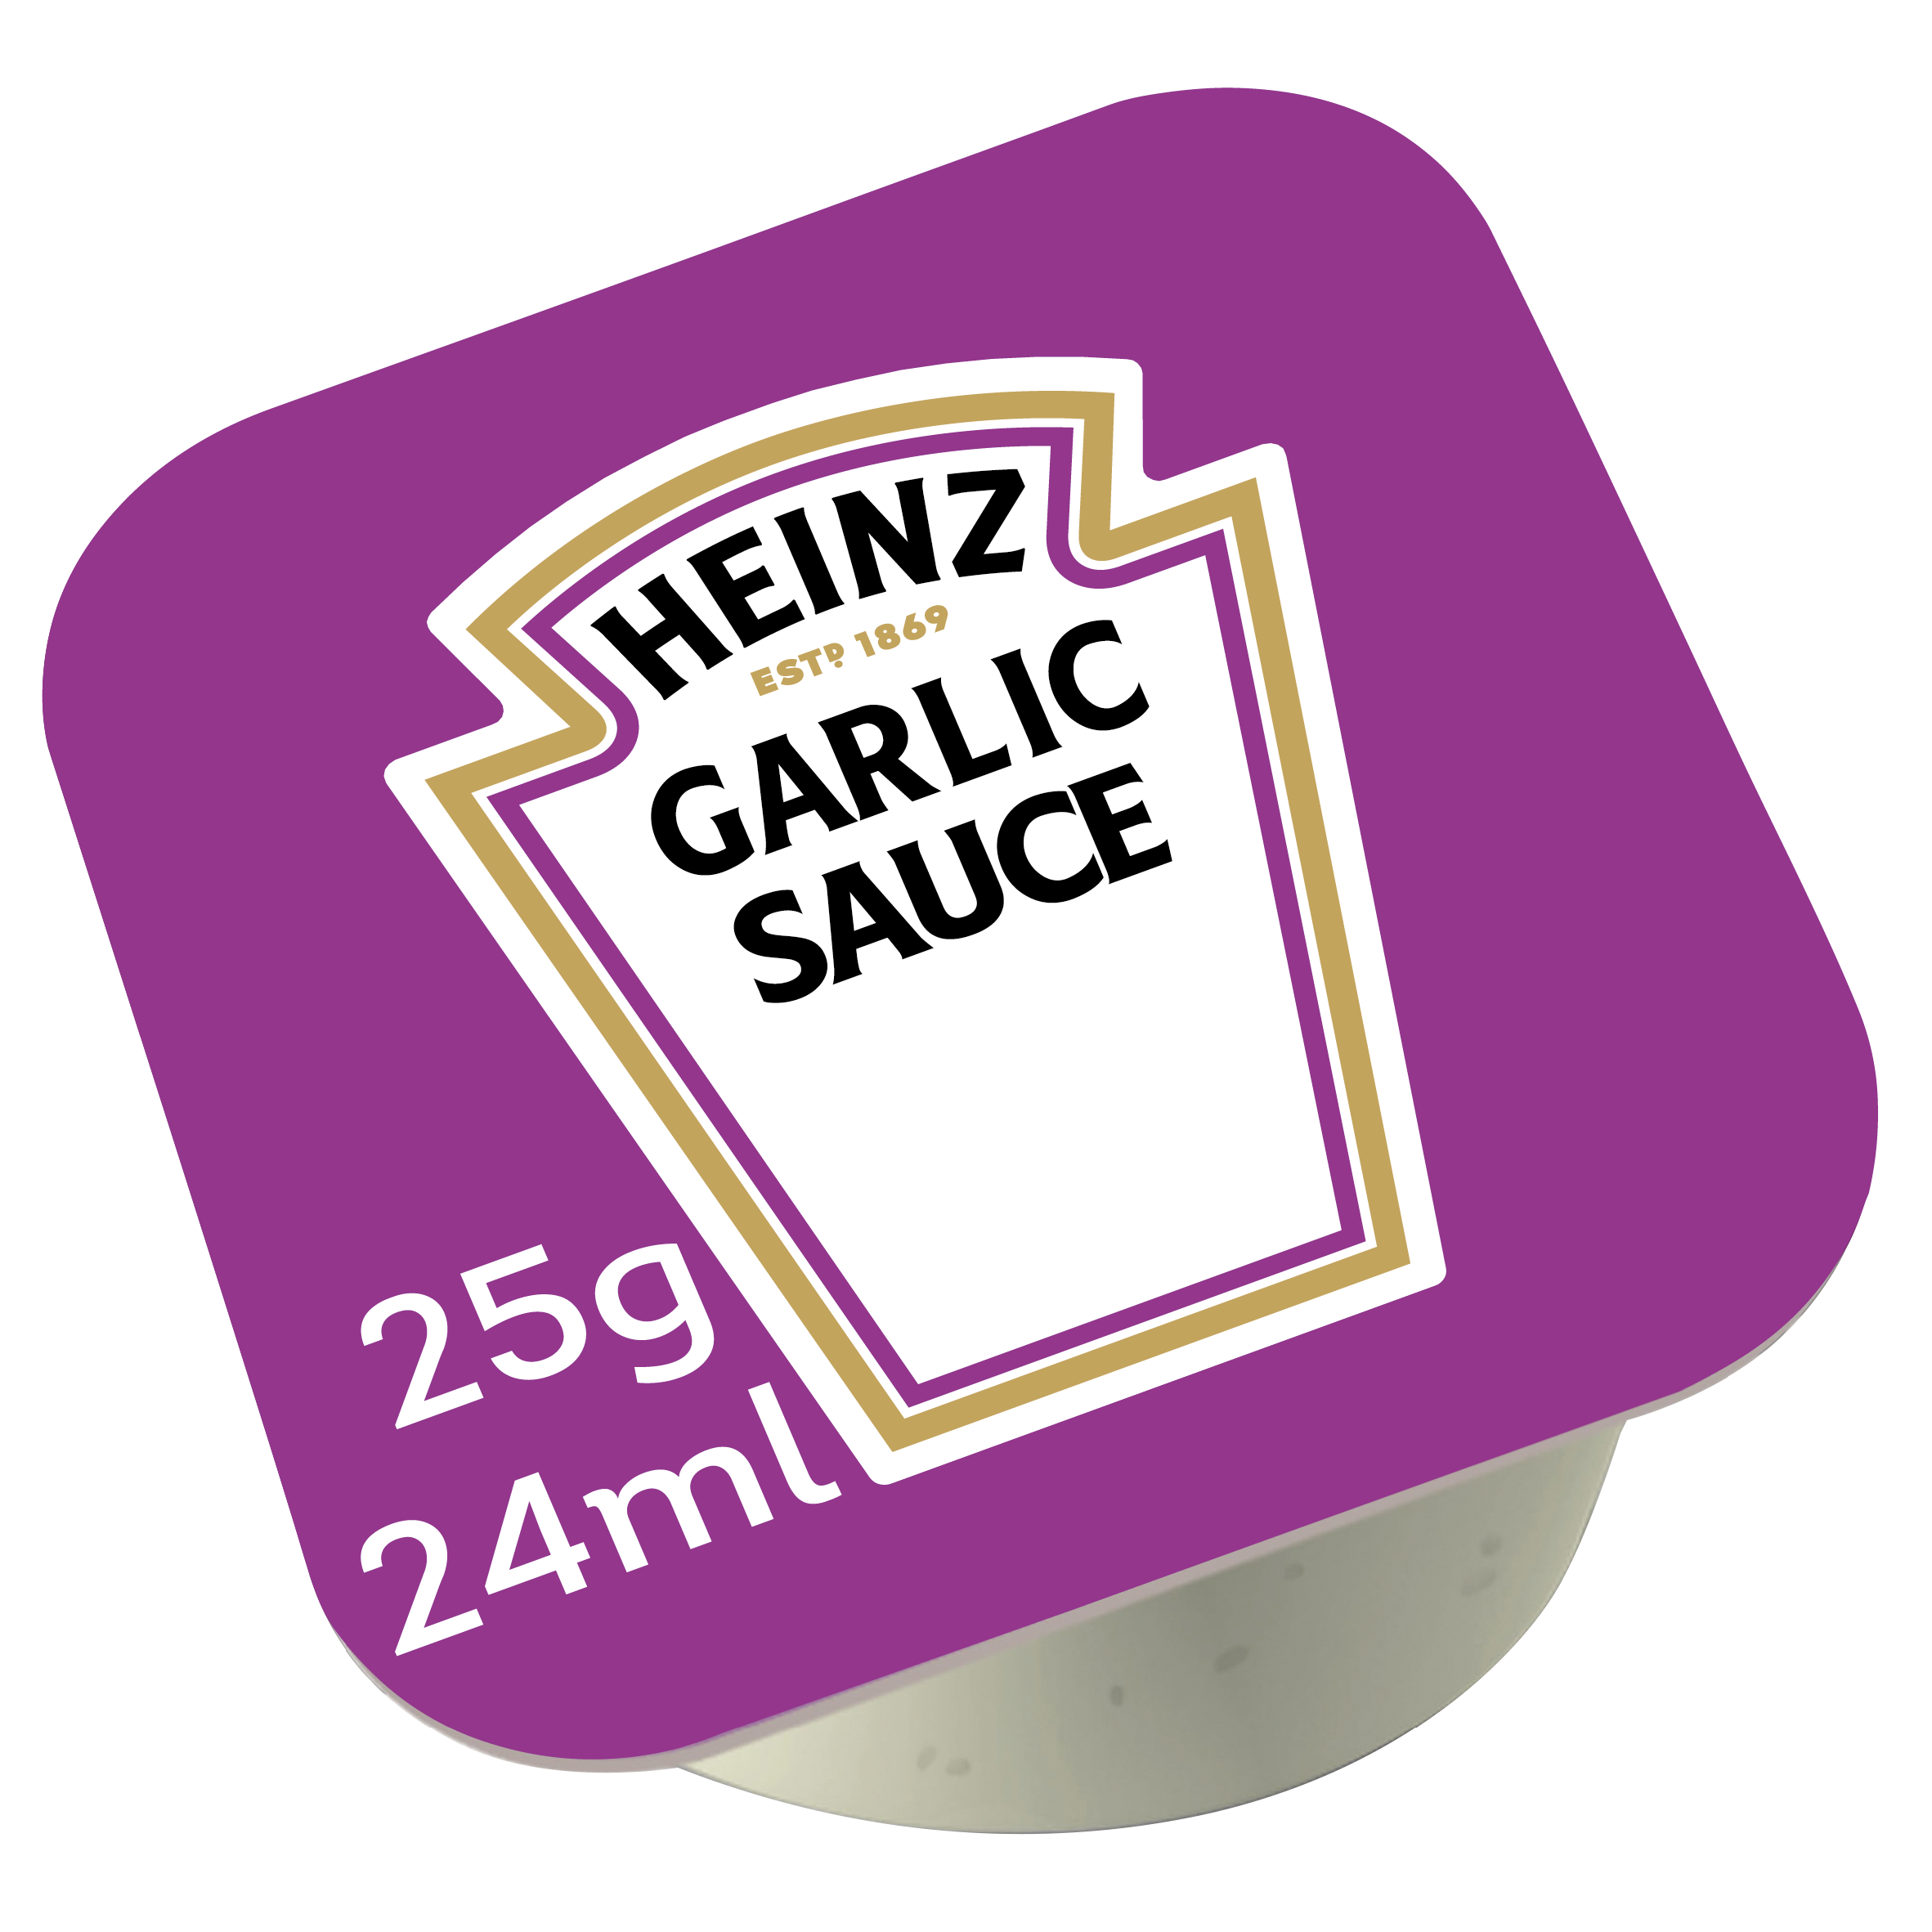 Heinz knoflooksaus dippot 25ml image